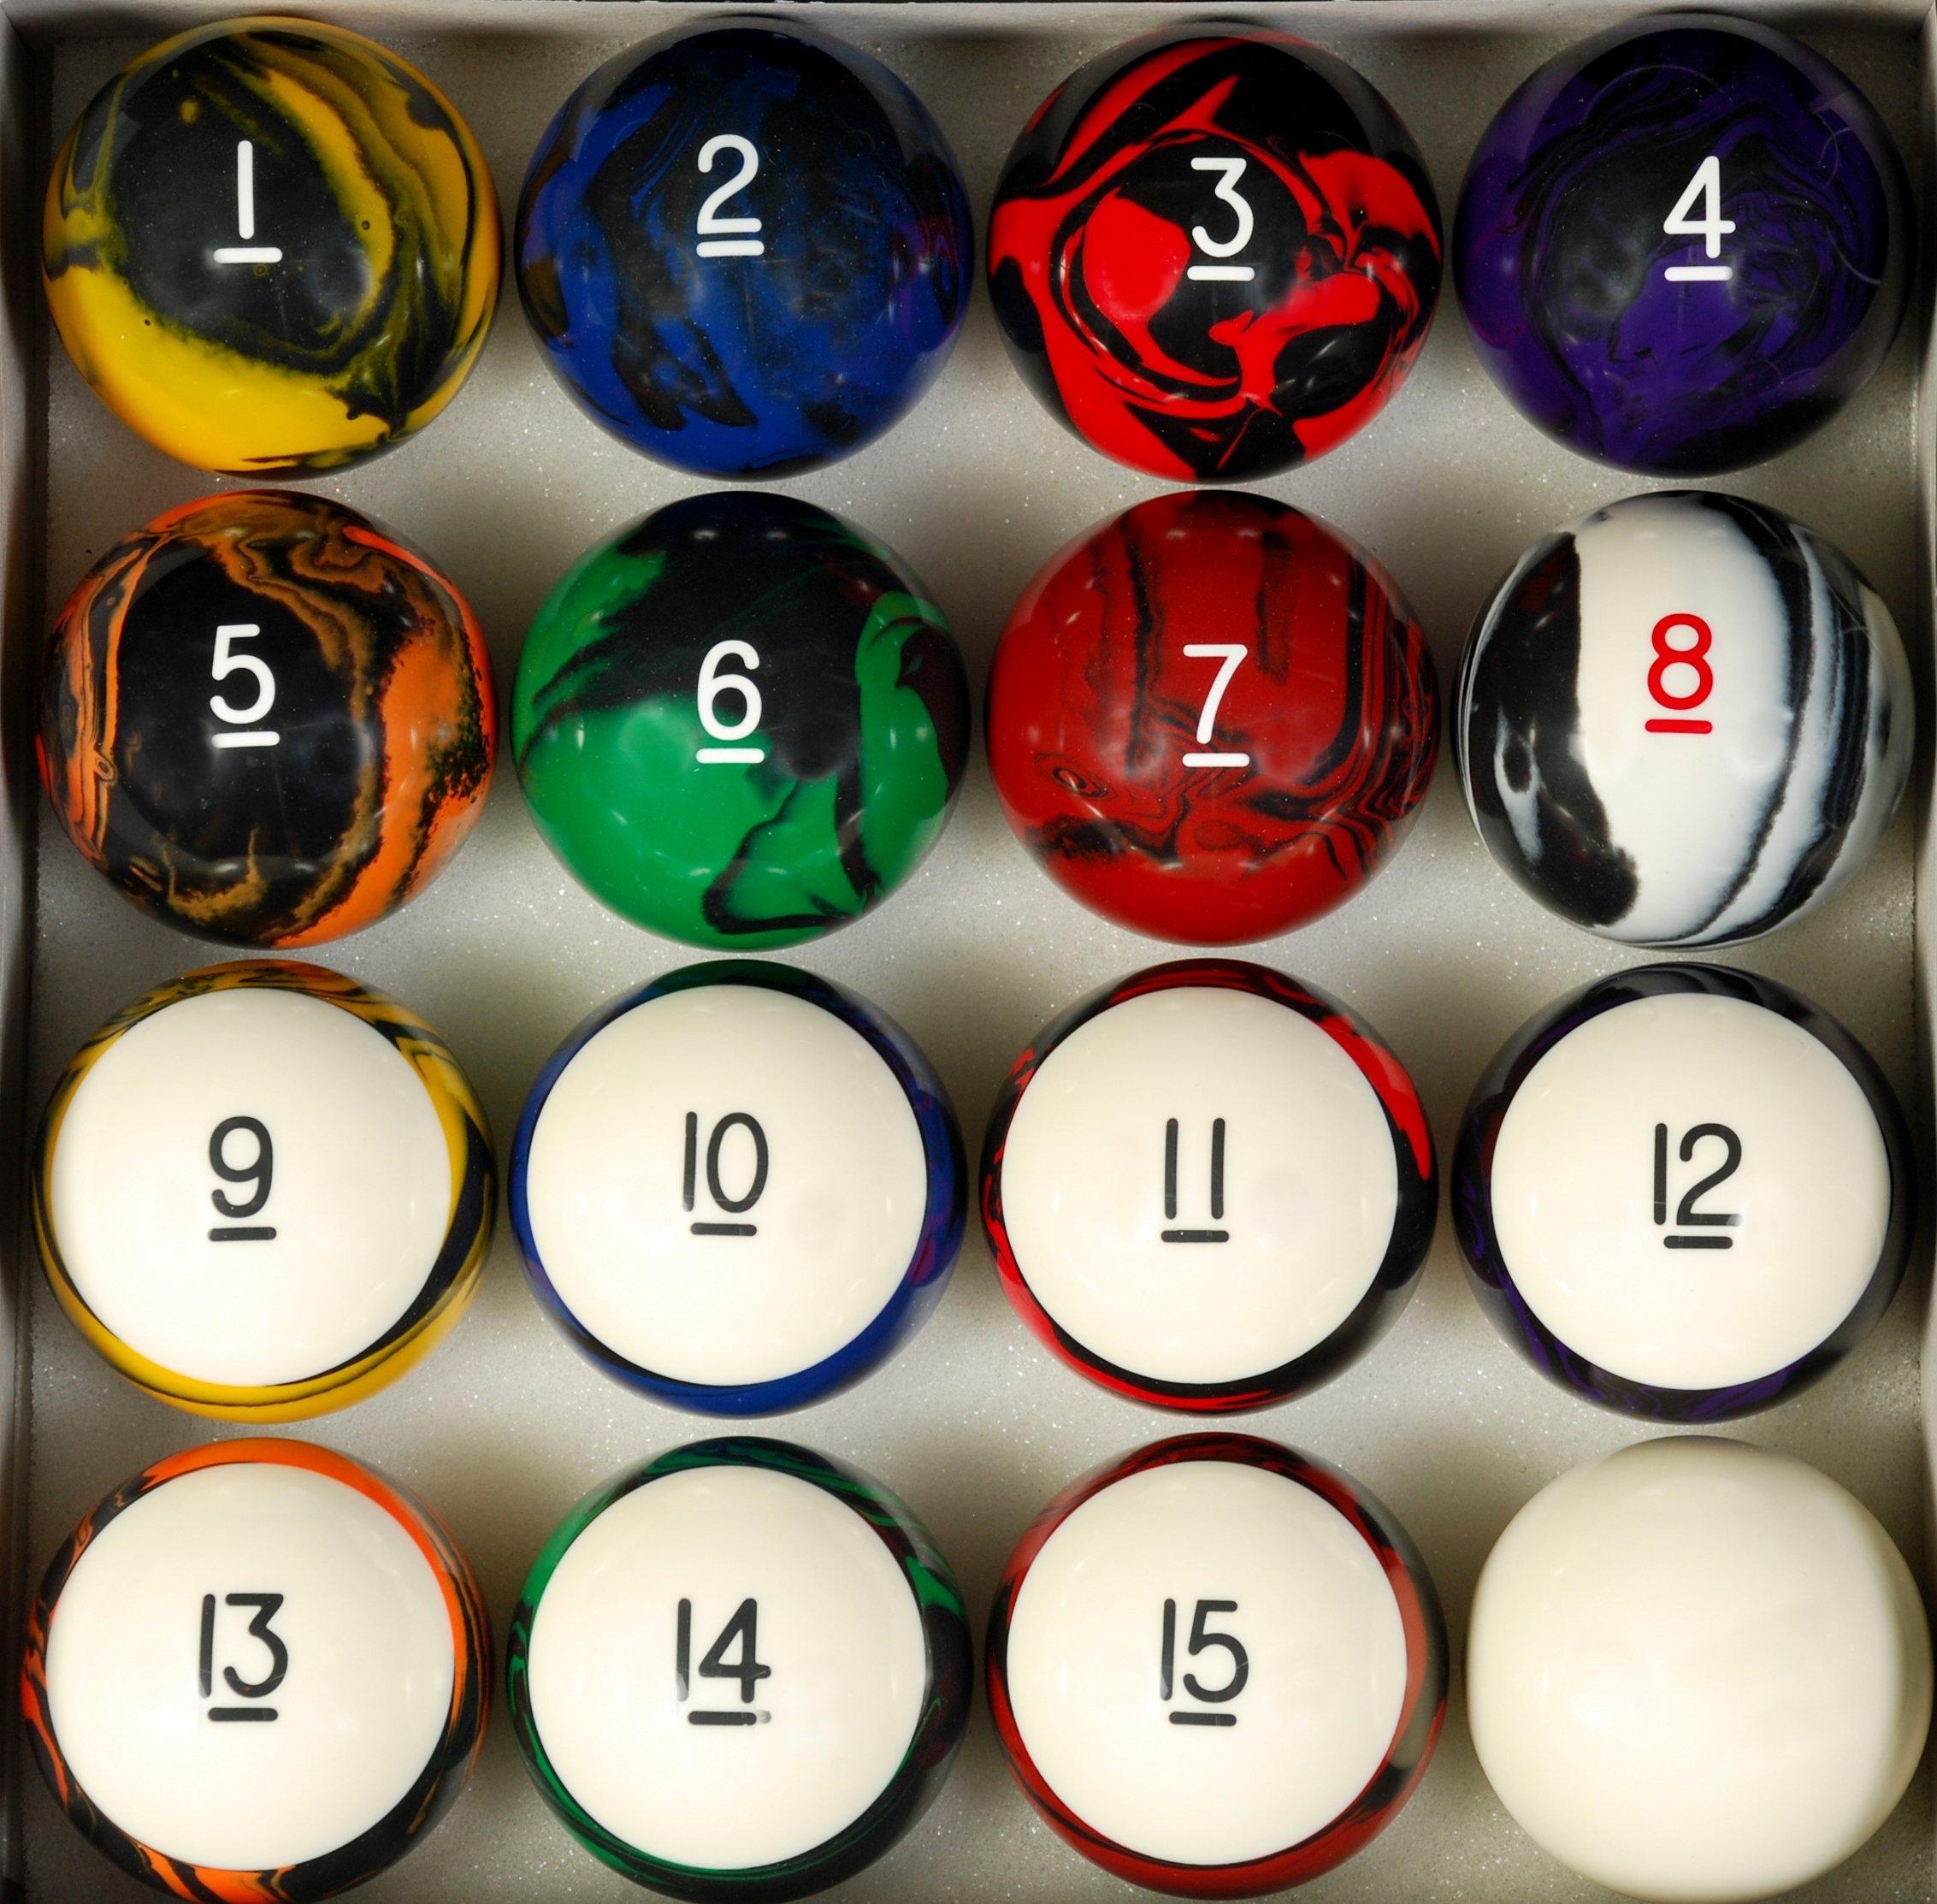 Pool Table Billiard Ball Set, Tech Style by Iszy Billiards